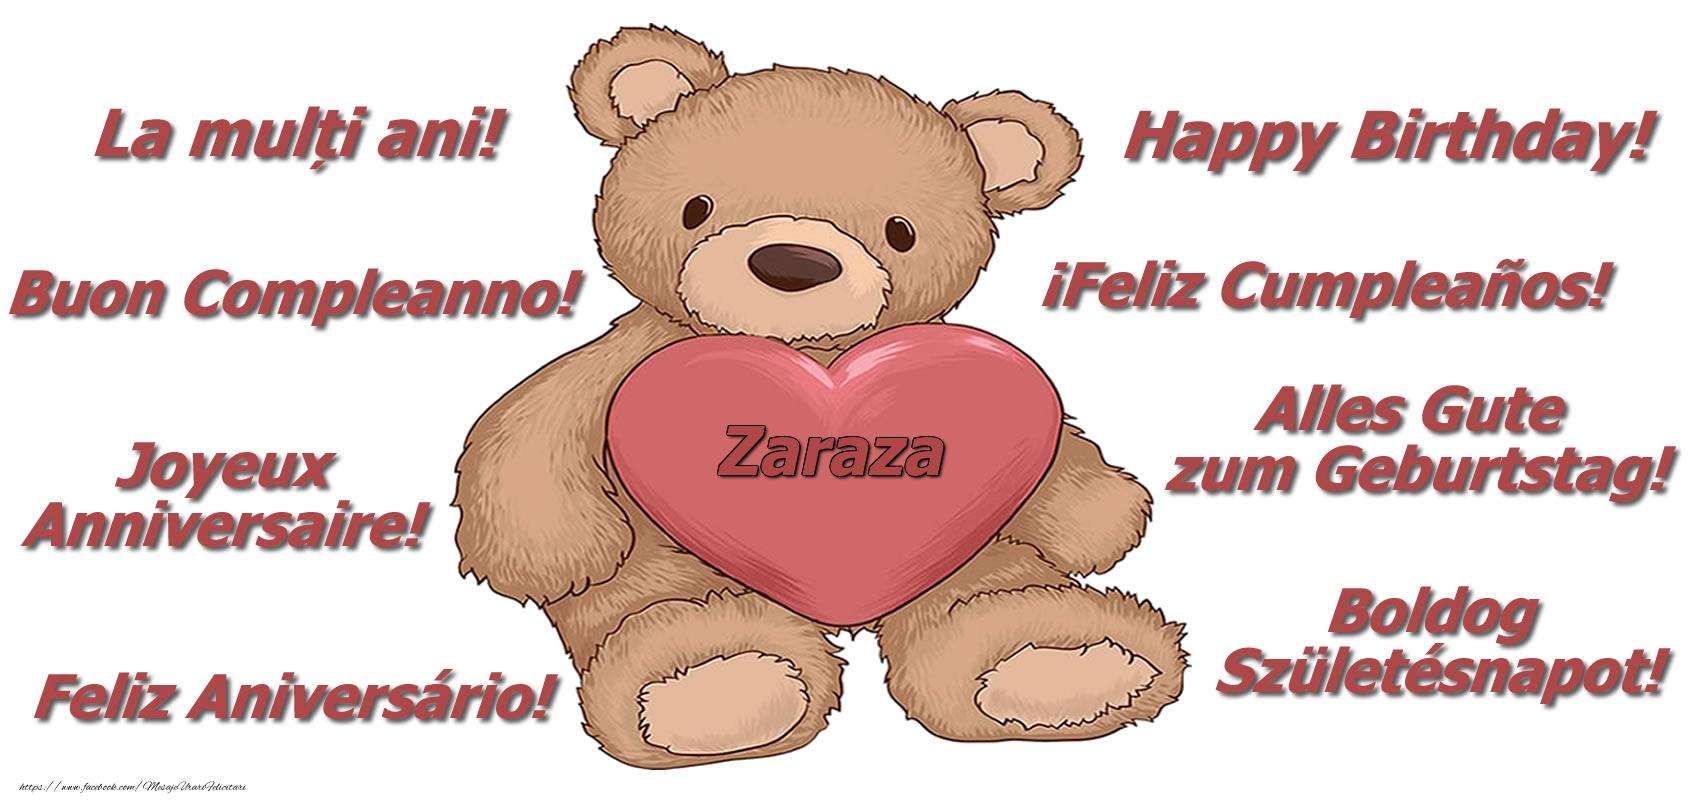 Felicitari de zi de nastere - La multi ani Zaraza! - Ursulet